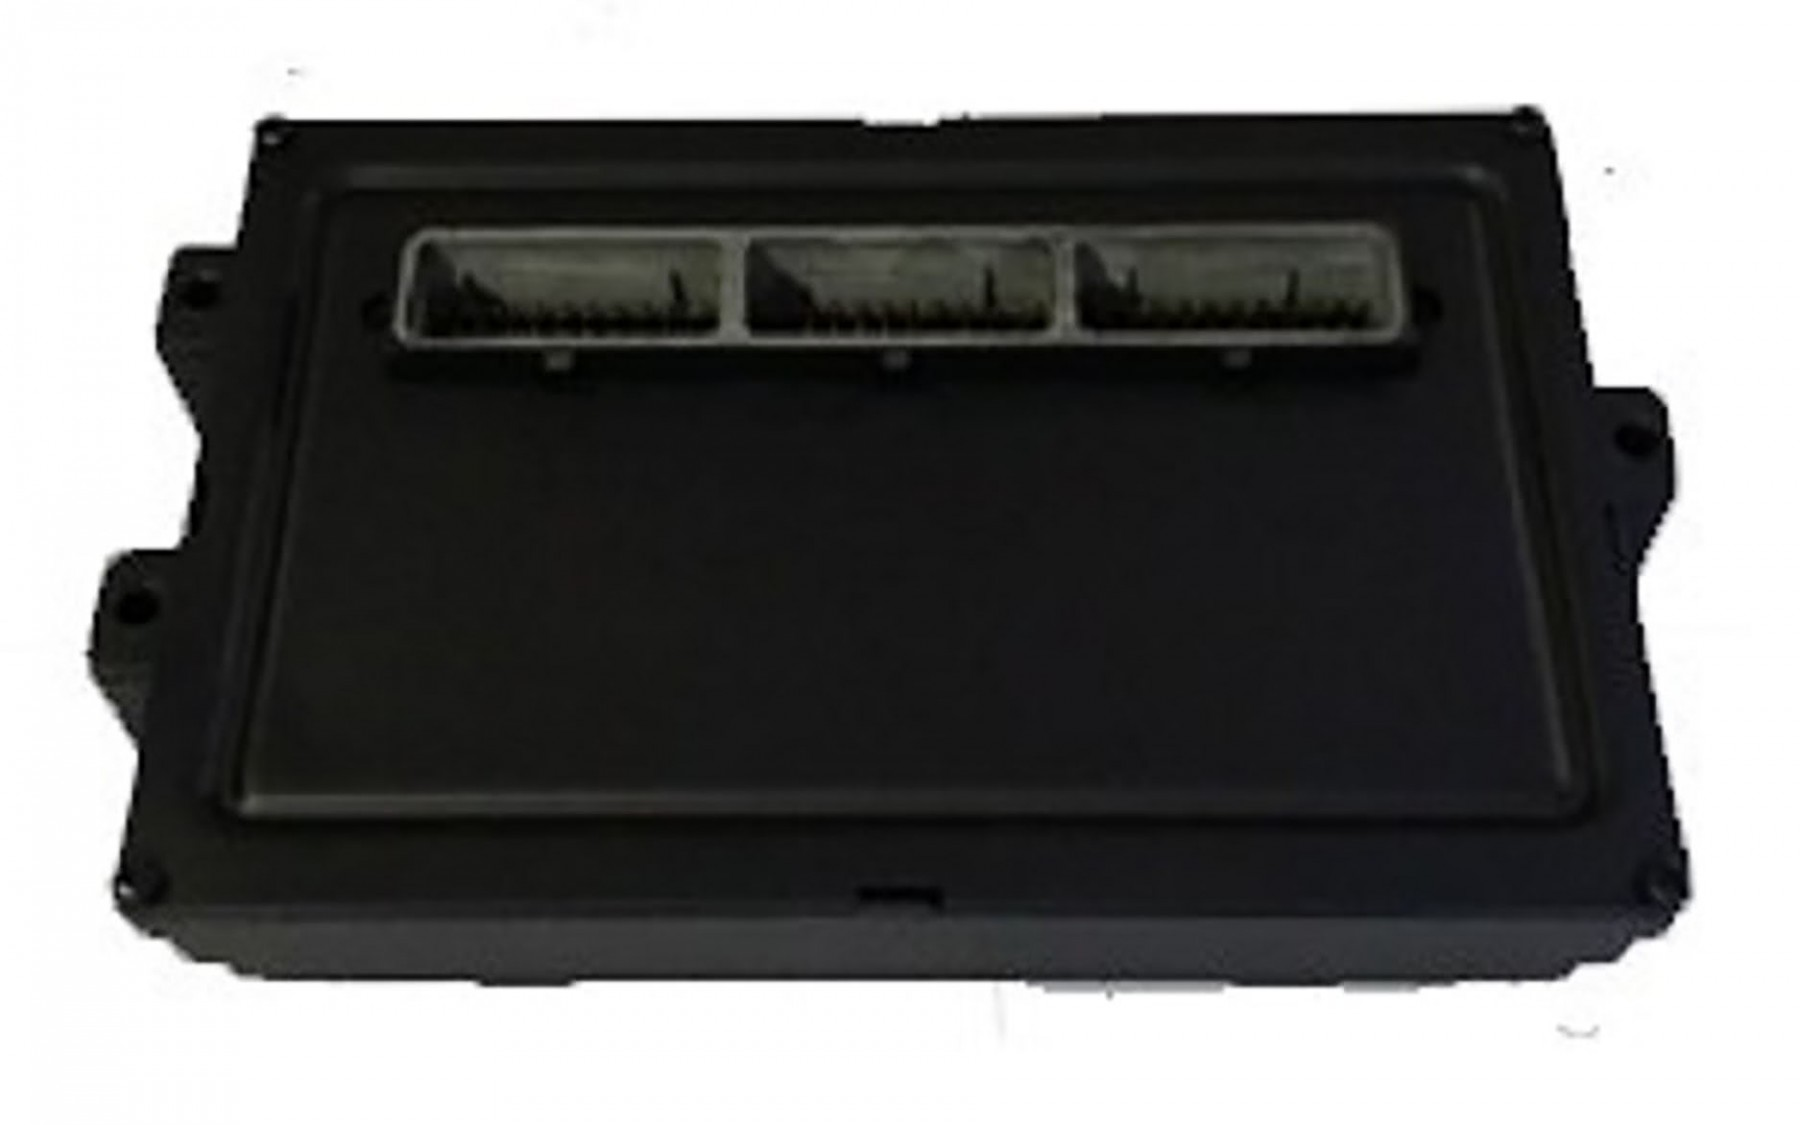 2001 jeep grand cherokee 4 7l v8 gas pcm ecu ecm engine computer. Black Bedroom Furniture Sets. Home Design Ideas